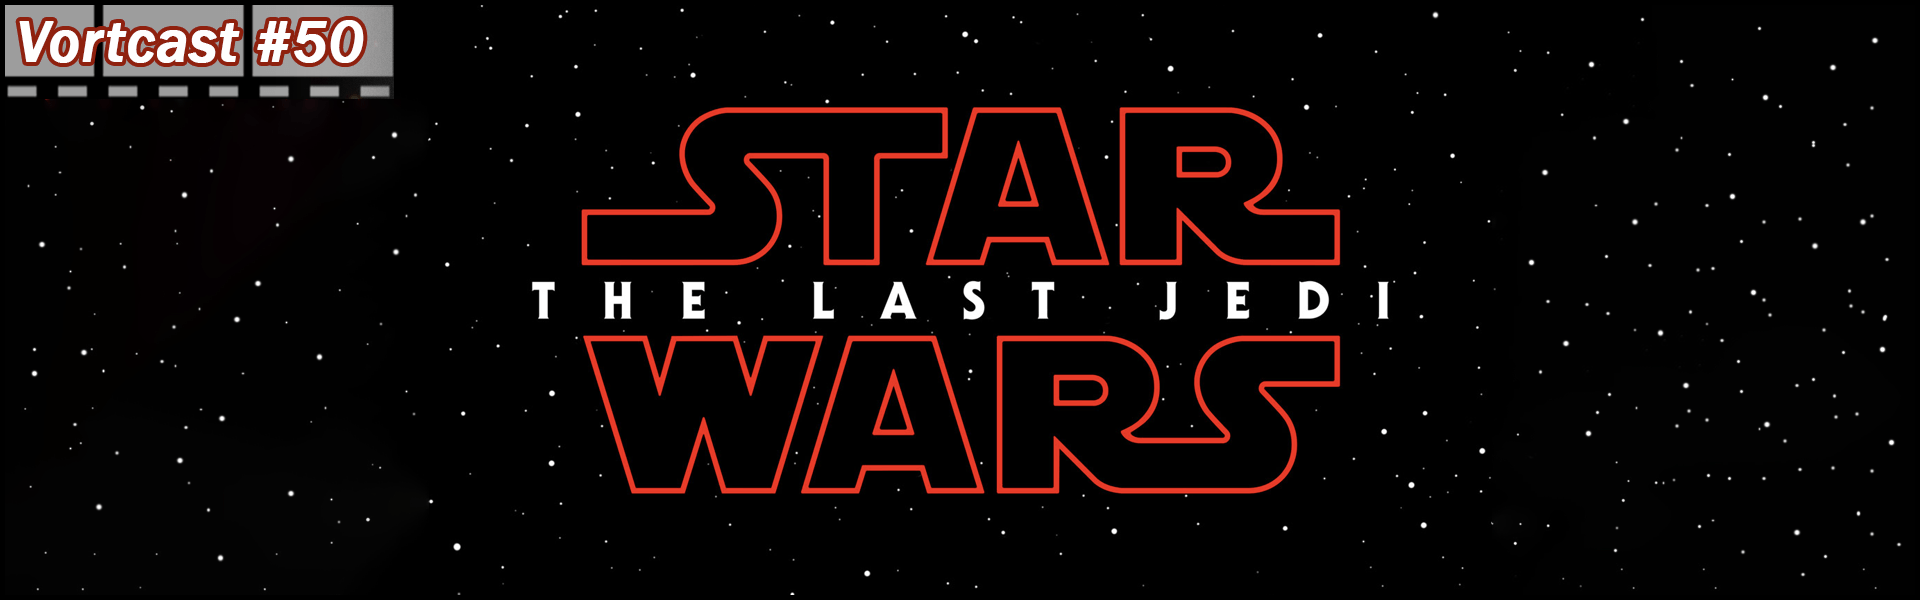 VortCast 50 | Star Wars: Os Últimos Jedi